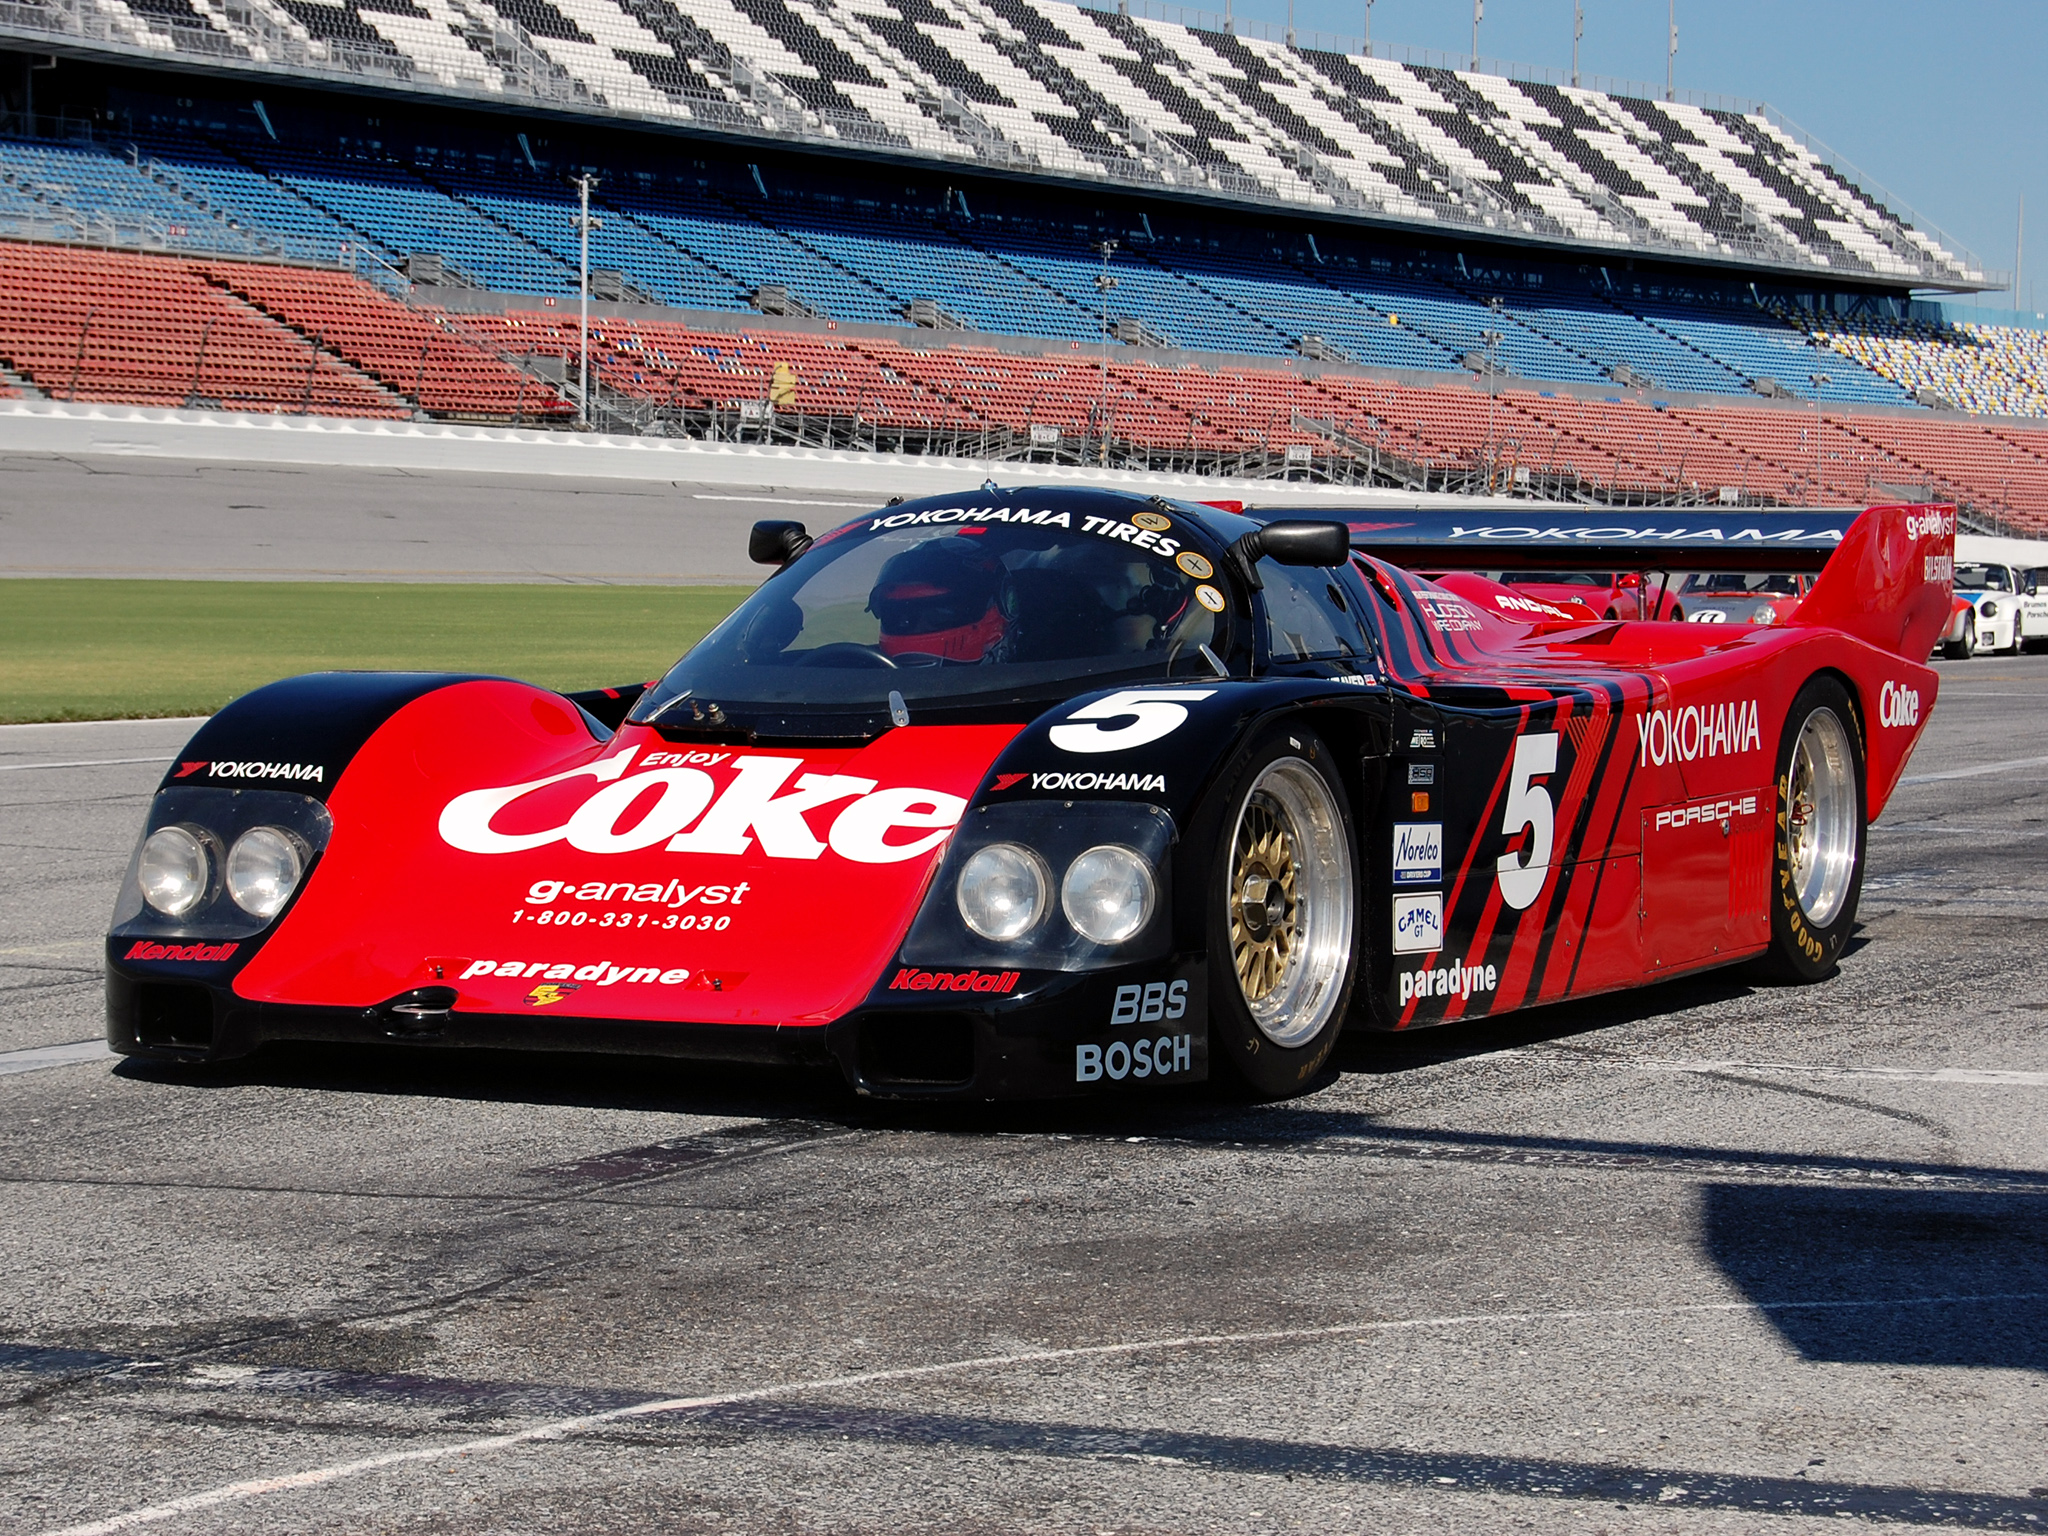 Porsche Imsa Racing Race Supercar Supercars Classic F